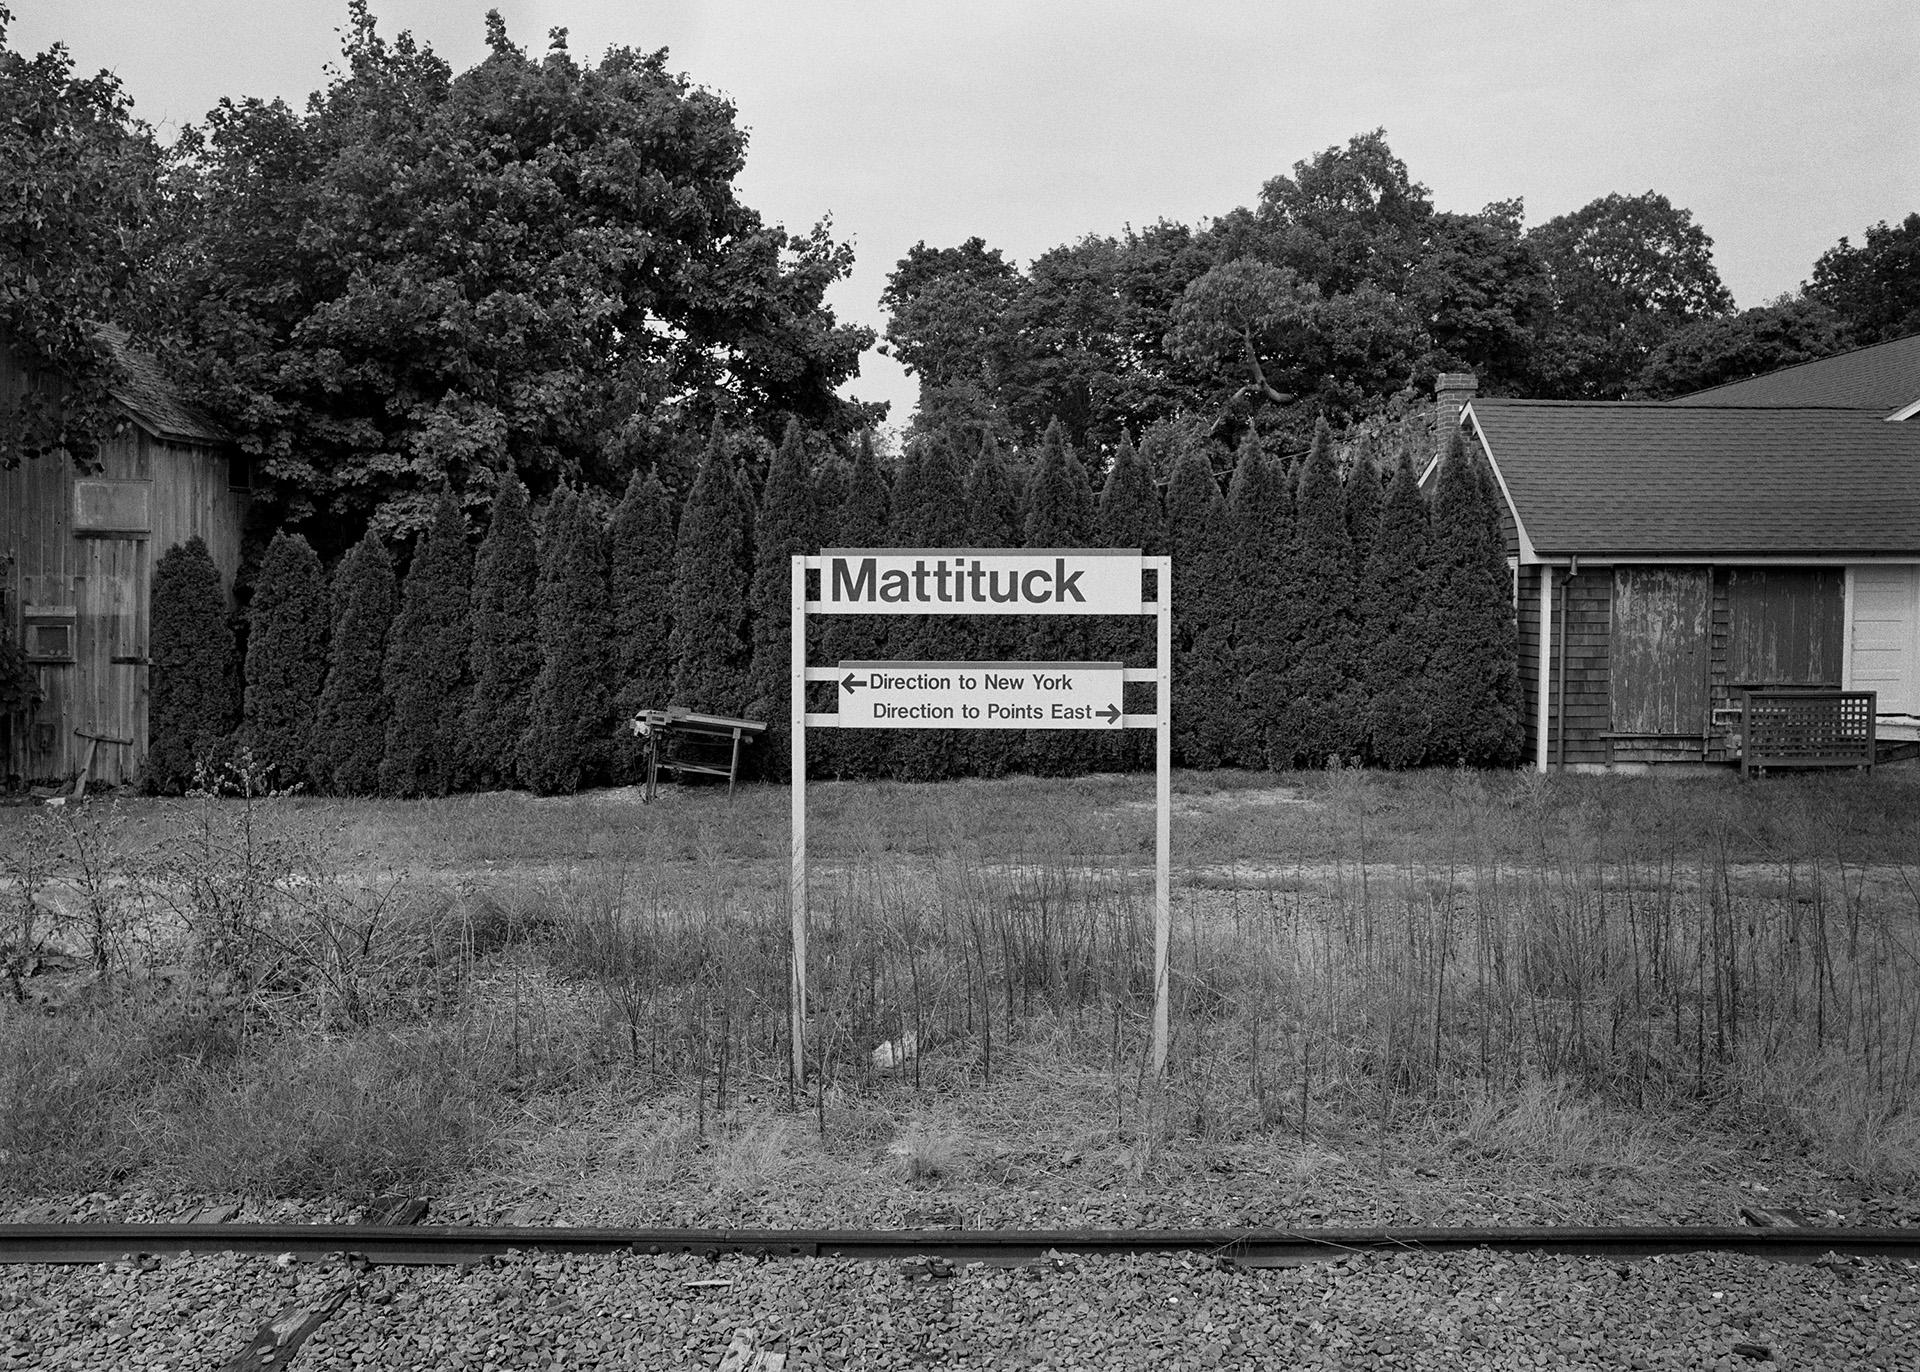 Mattituck Station